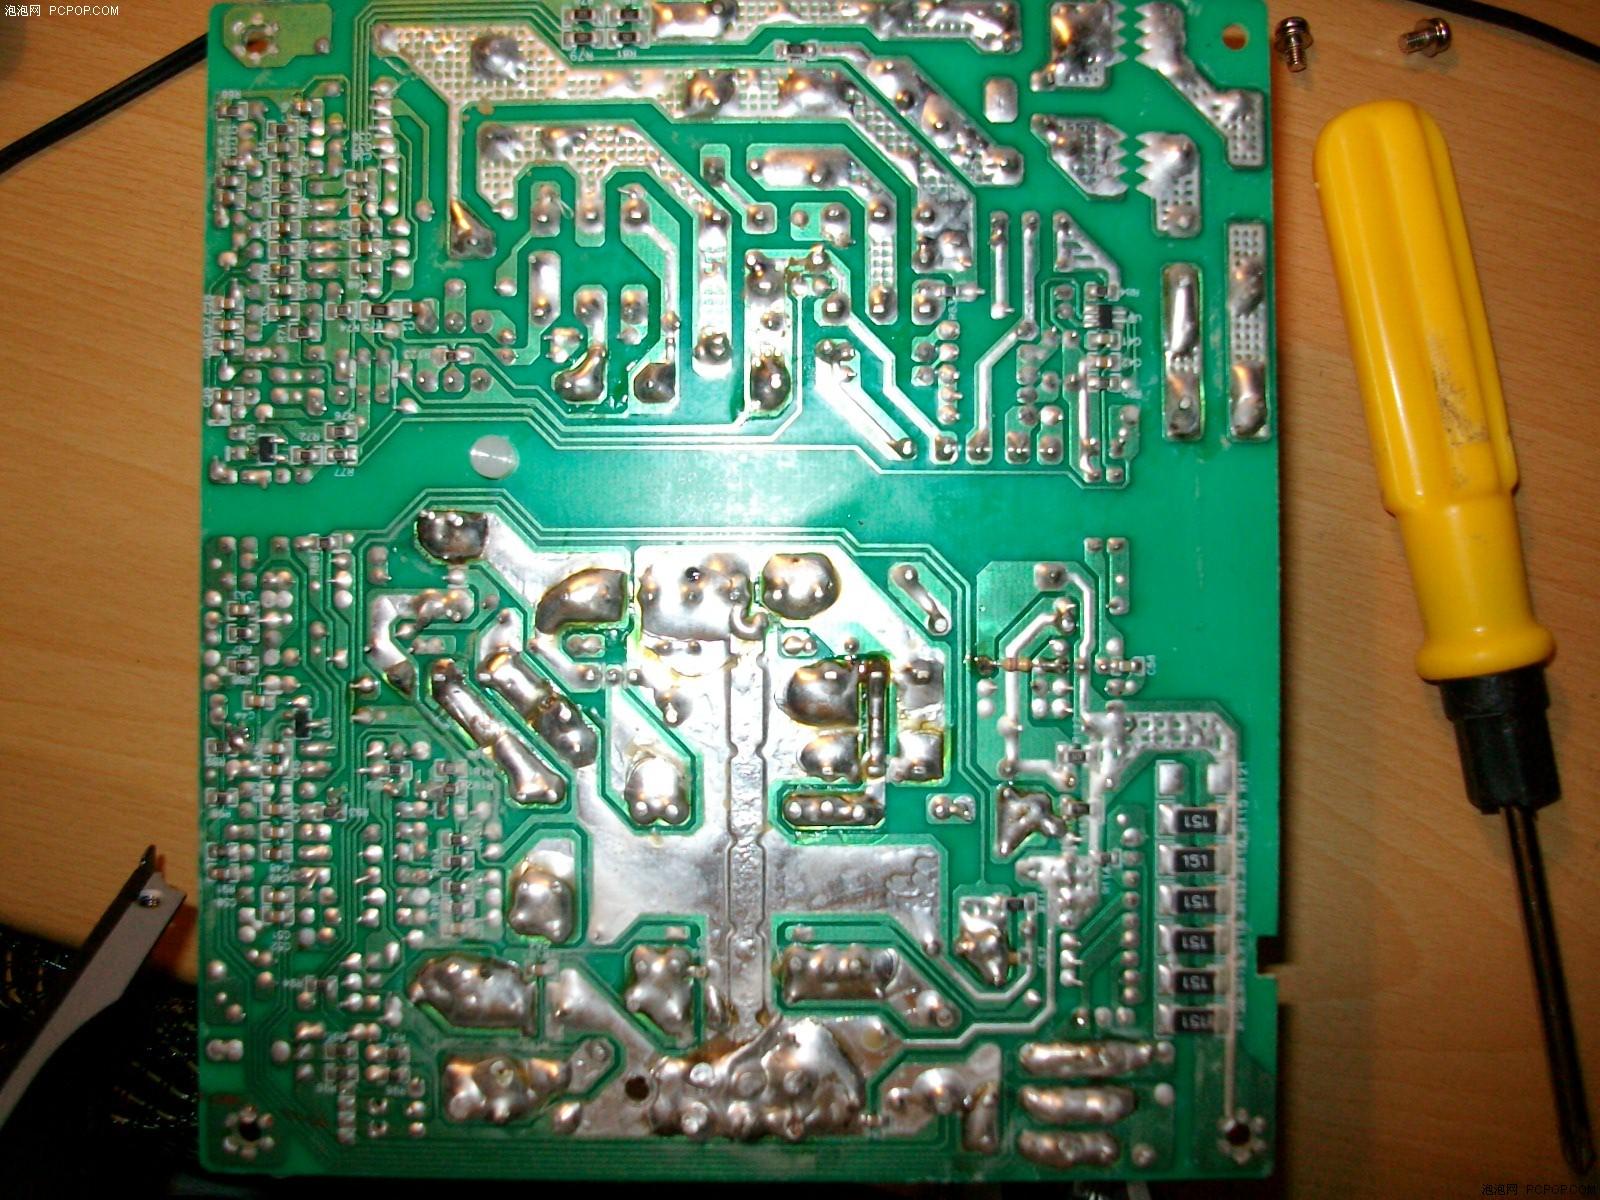 电路板 1600_1200